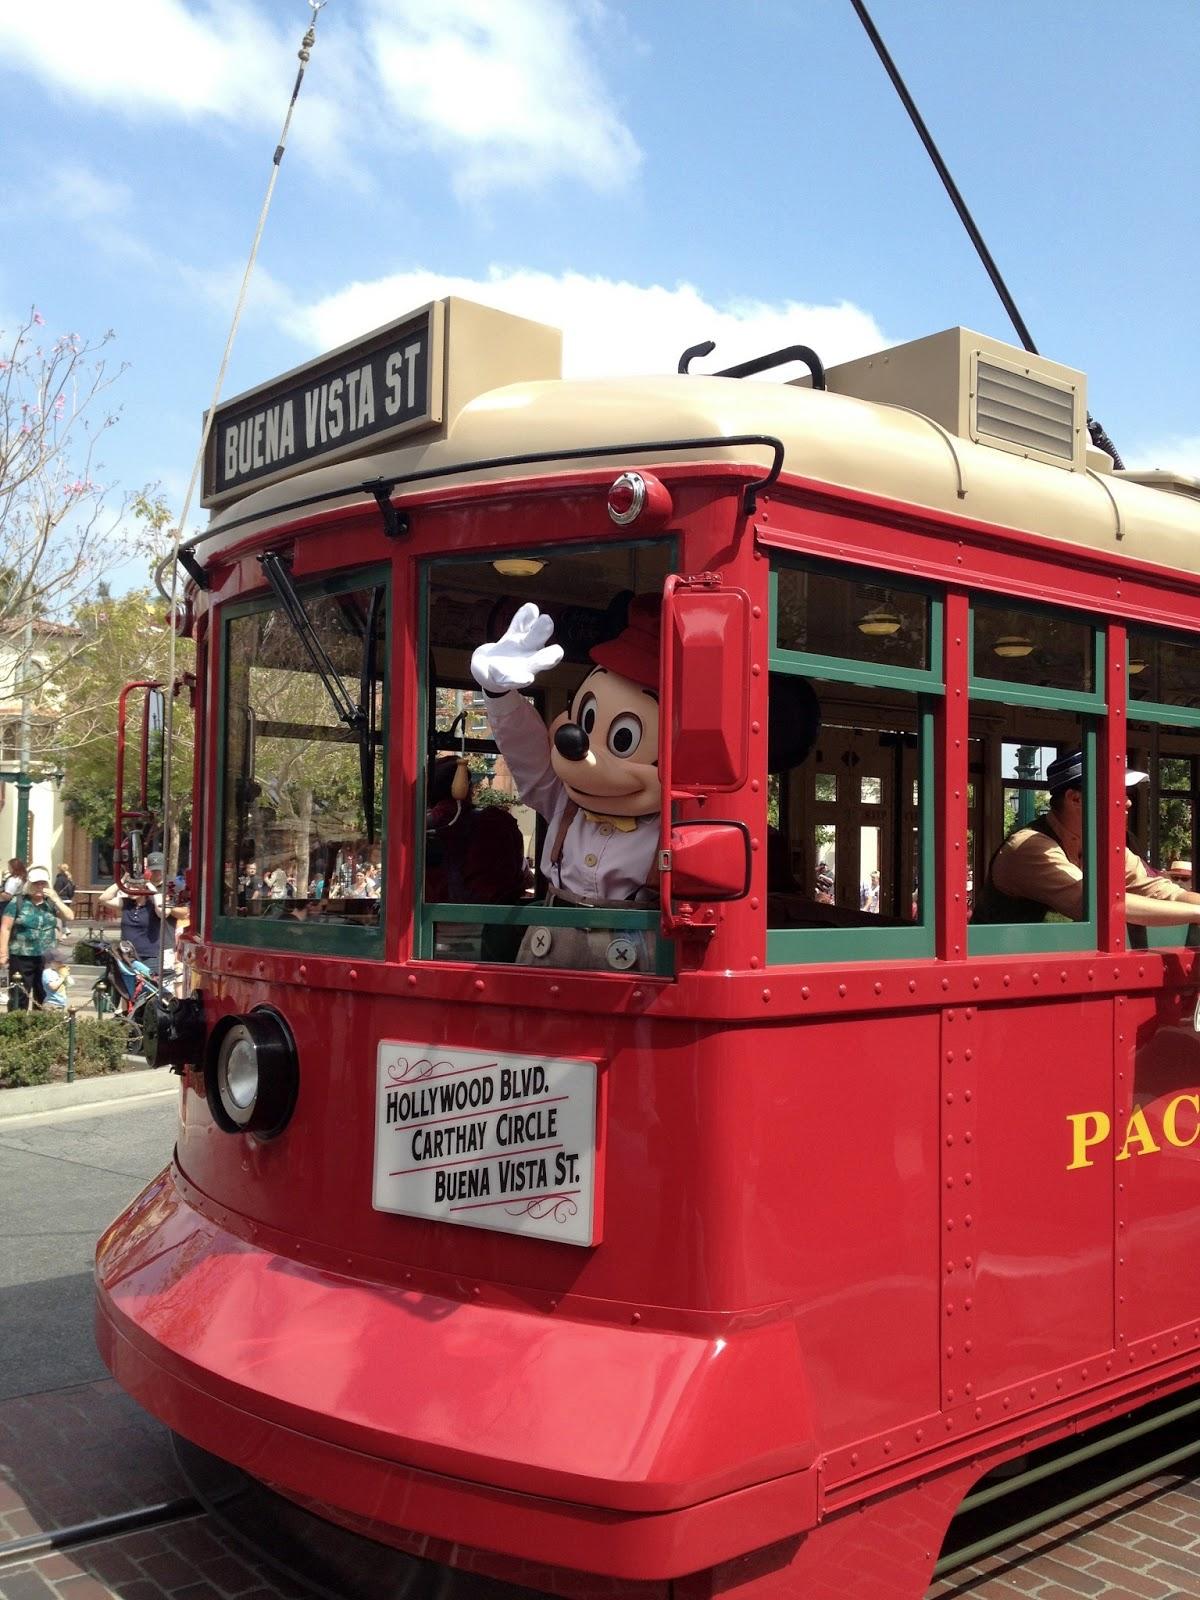 disney, disneyland, california adventure, bugs land, cars land, a bugs life, cars, flick, disney apparel, disney blog, fashion blog, style blog, ootd, mens style, womens style, california adventure ferris wheel, pixar parade, toystory, pixar, the incredibles, mr. incredible, parade, disney parade, nemo, finding nemo, trolley, mickey mouse on a trolley